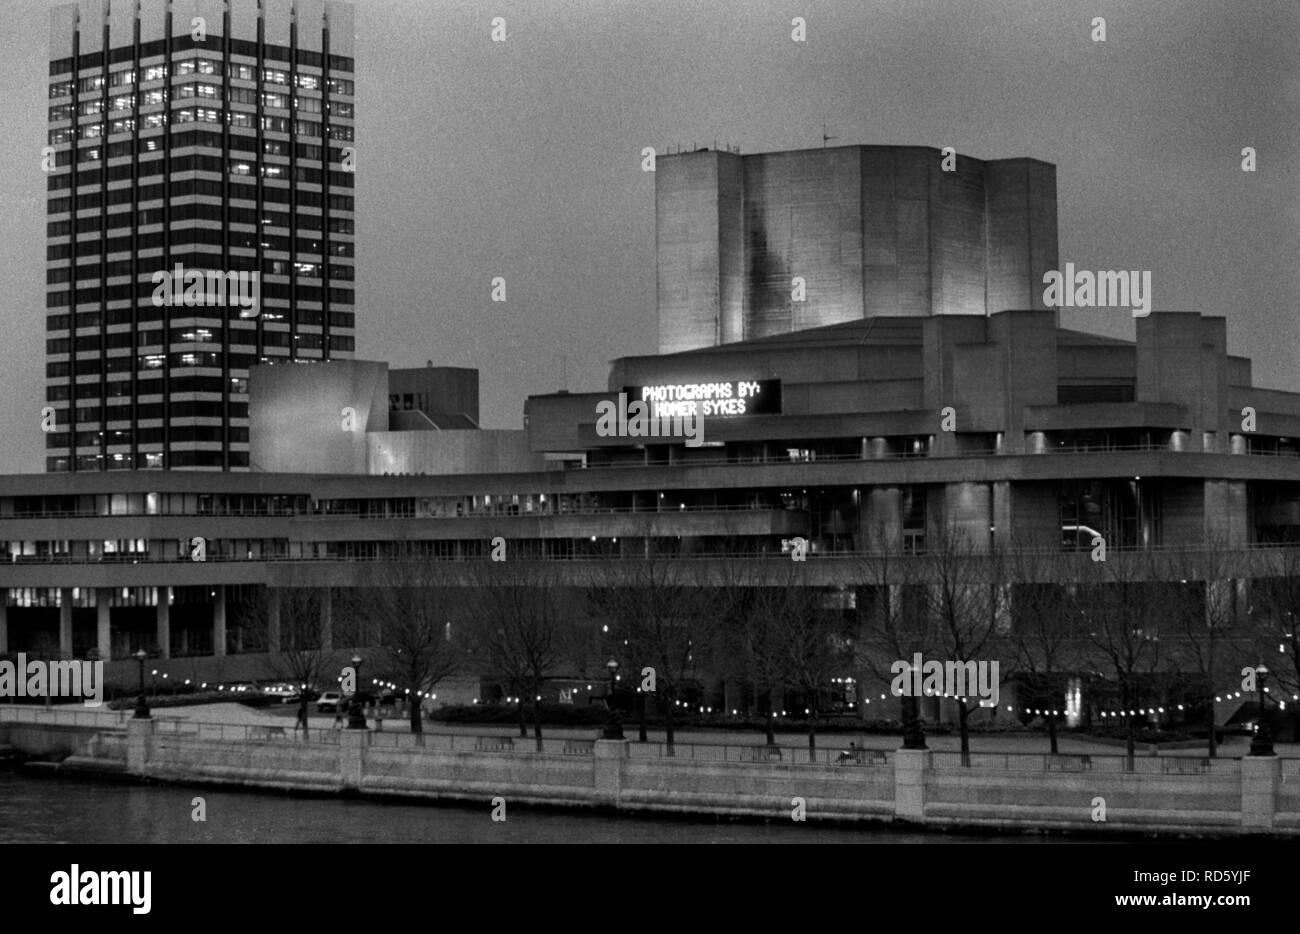 Teatro Nacional, South Bank, Londres 1980, fotografías por Homero Sykes. Mi exposición de mi libro La temporada inglesa. 80s UK HOMER SYKES Imagen De Stock